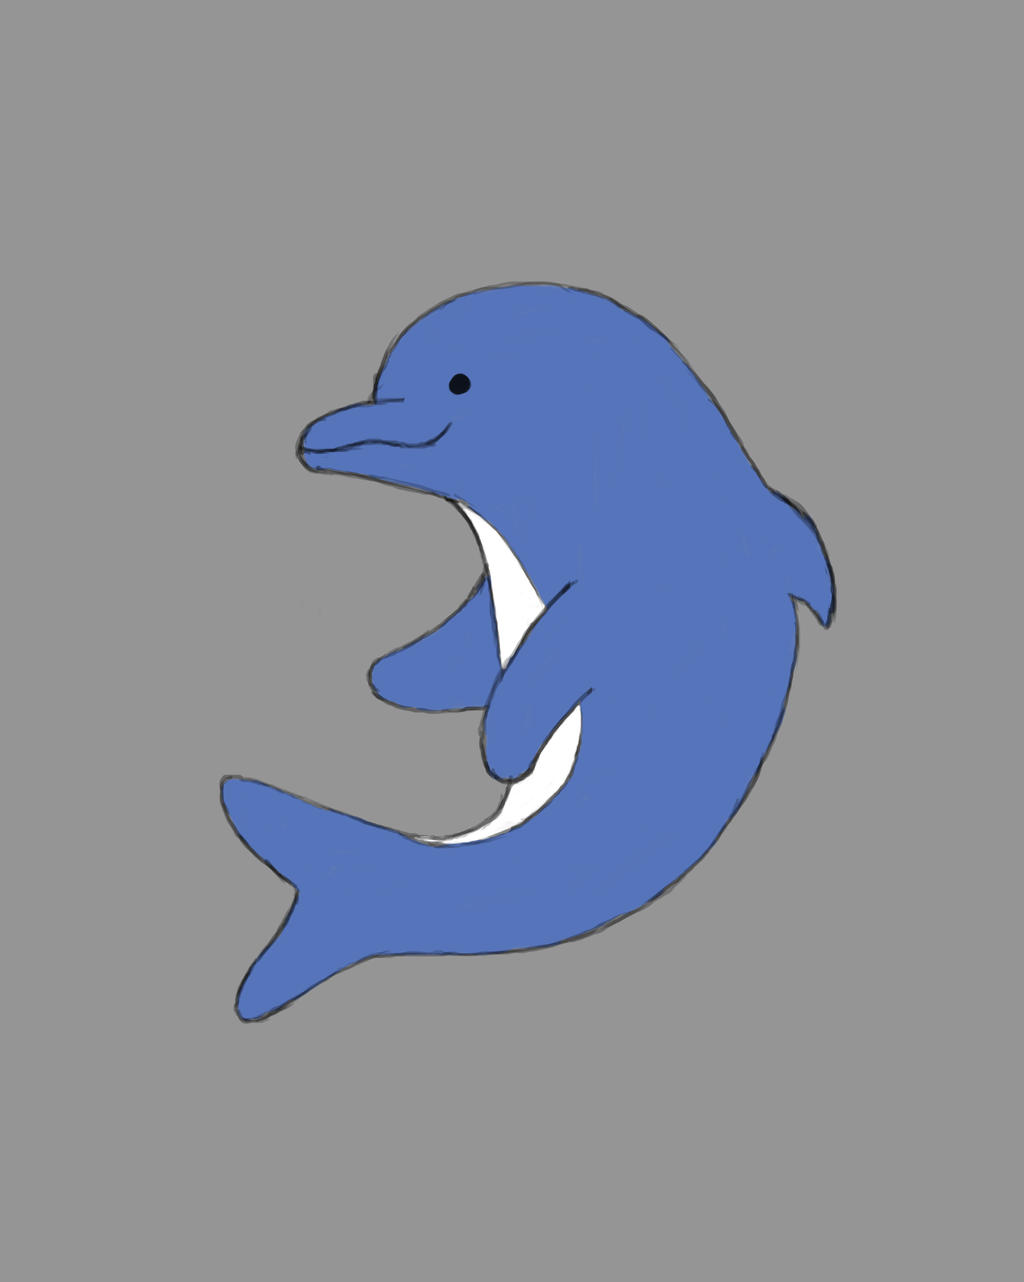 Cute Dolphin Daily sketch #728 by GothicVampireFreak